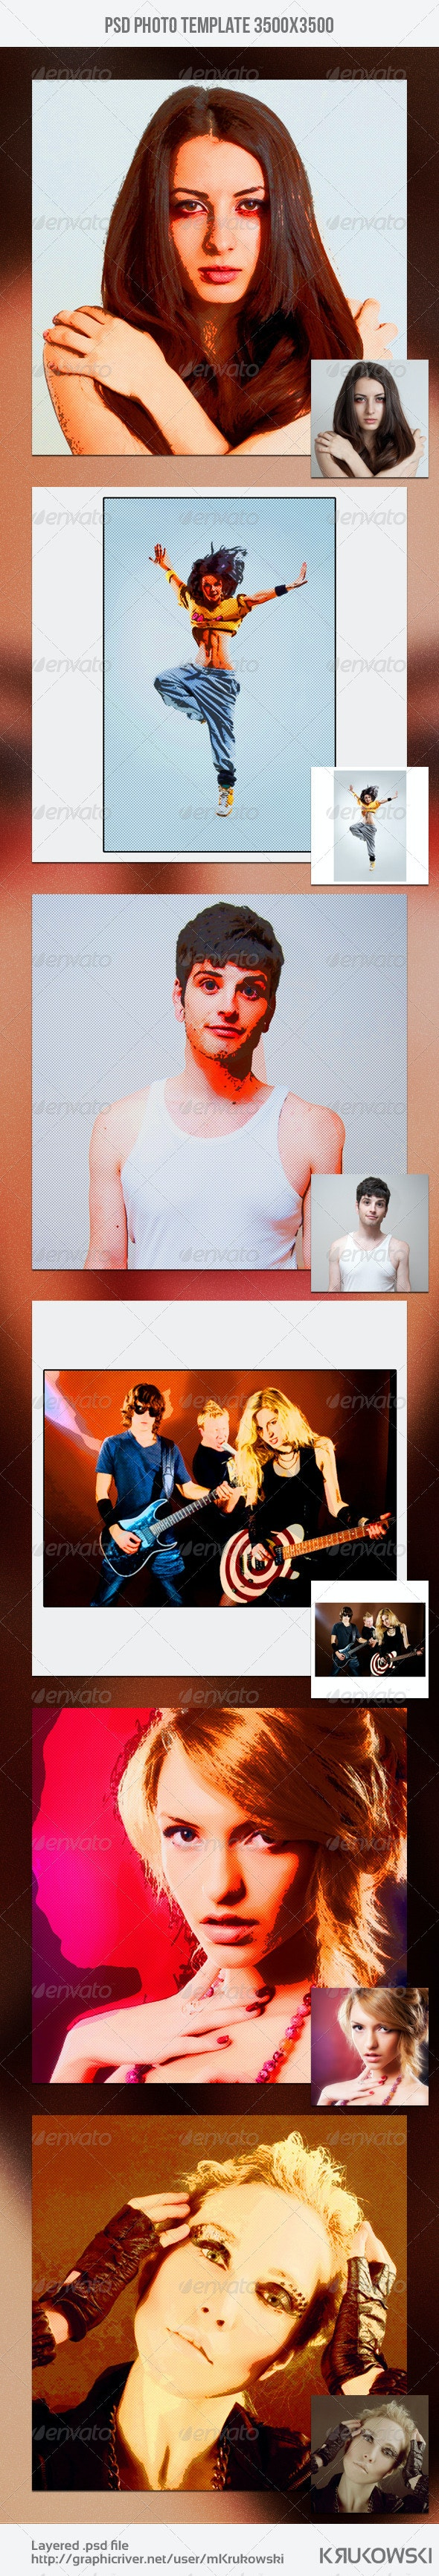 Pop Art Photo Template - Artistic Photo Templates